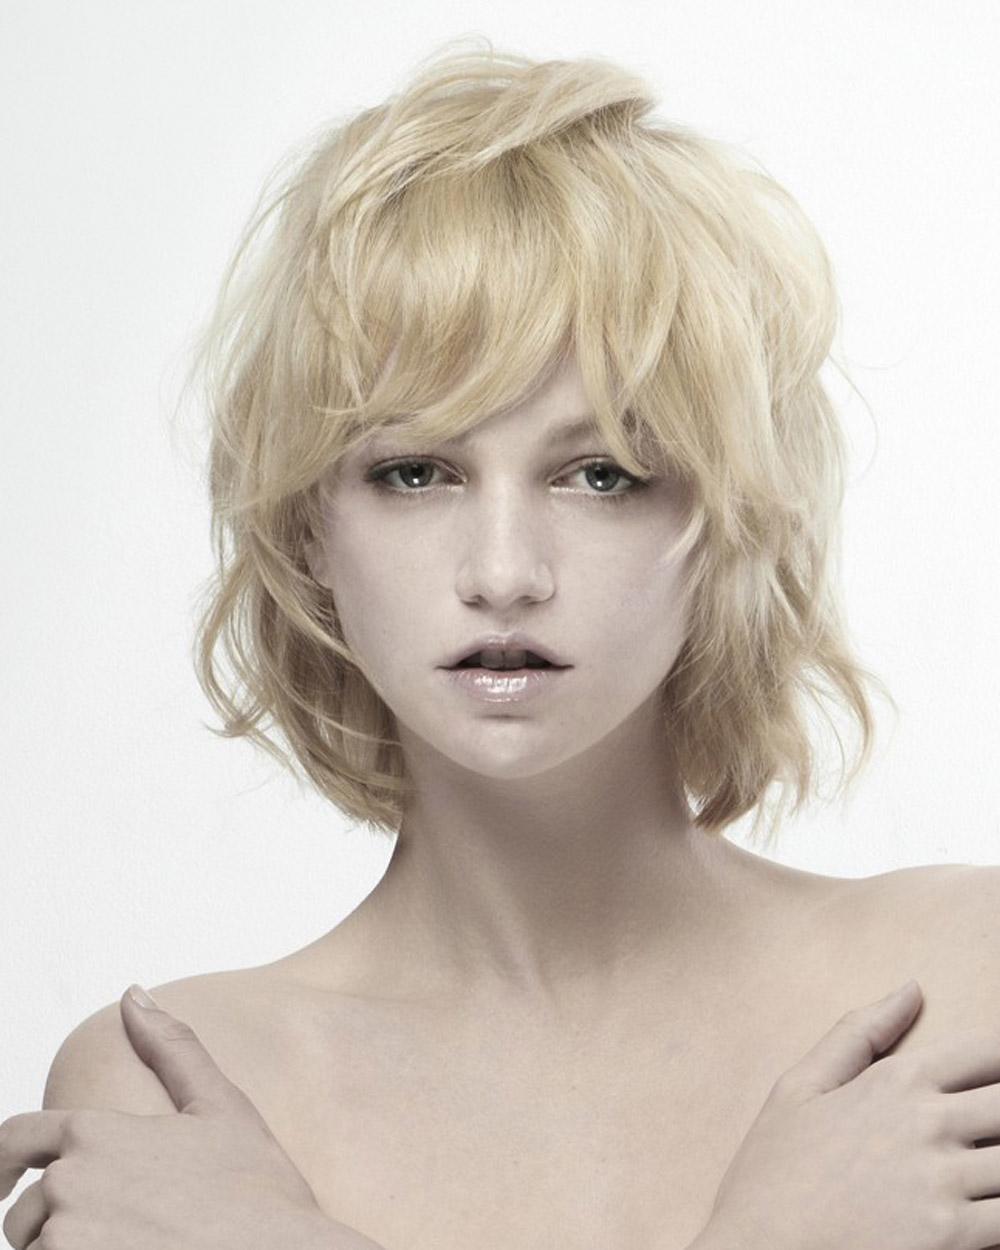 Blond wob pro jemné vlasy (L'anza – Purity Collection, vlasy: Matt Swinney, Ammon Carver & Natasja Keijzer for L'ANZA, produkty: L'ANZA, asistent: Mark Dolan, make-up: Chico Mitsui, foto: David Byun.)